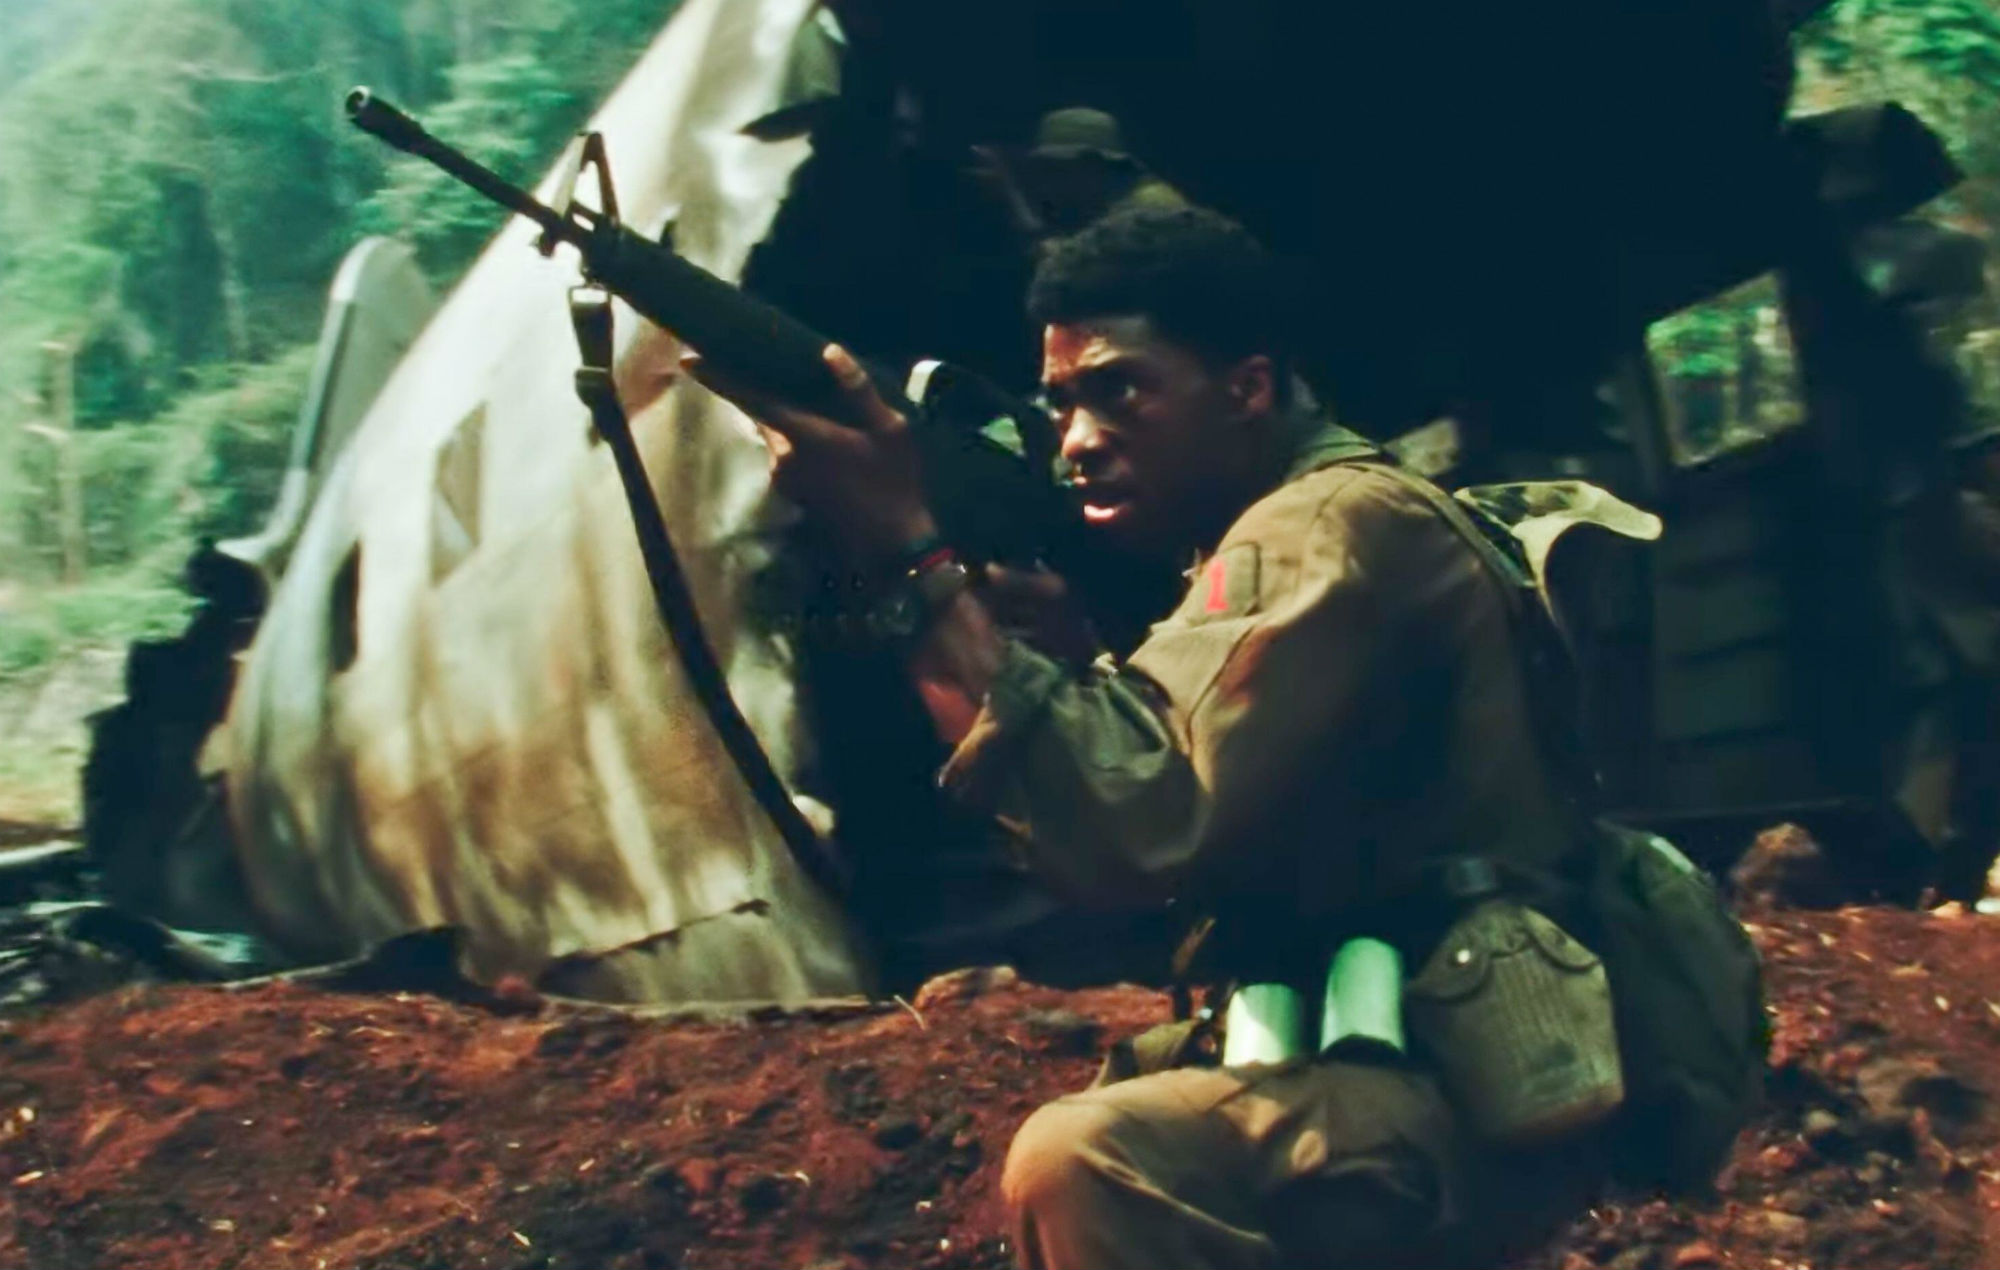 Spike Lee's 'Da 5 Bloods': Black Vietnam veterans discuss their plight